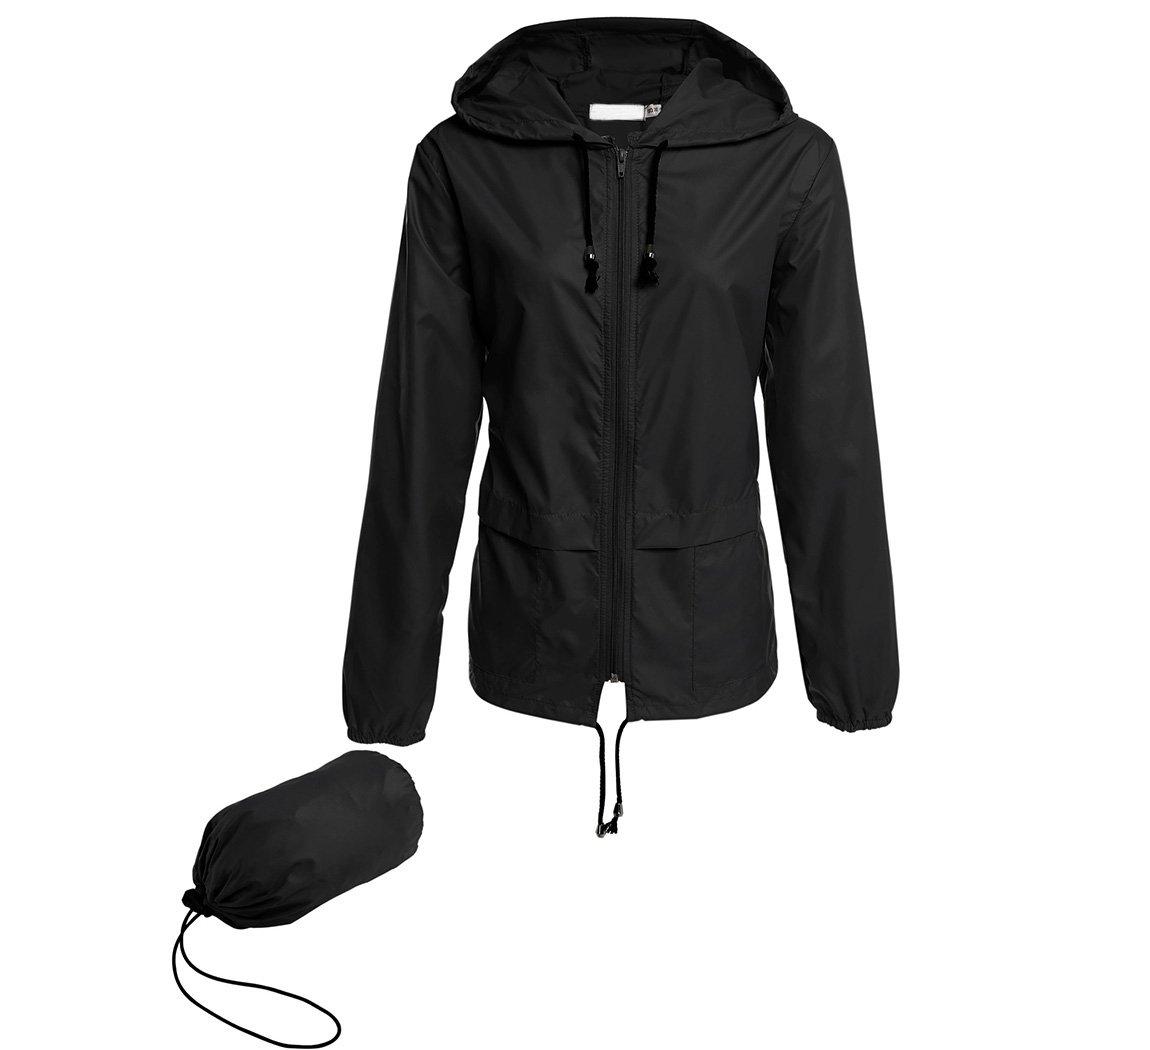 Hount Women's Lightweight Travel Trench Raincoat Hoodie Waterproof Hiking Coat Packable Rain Jacket (L, Black)